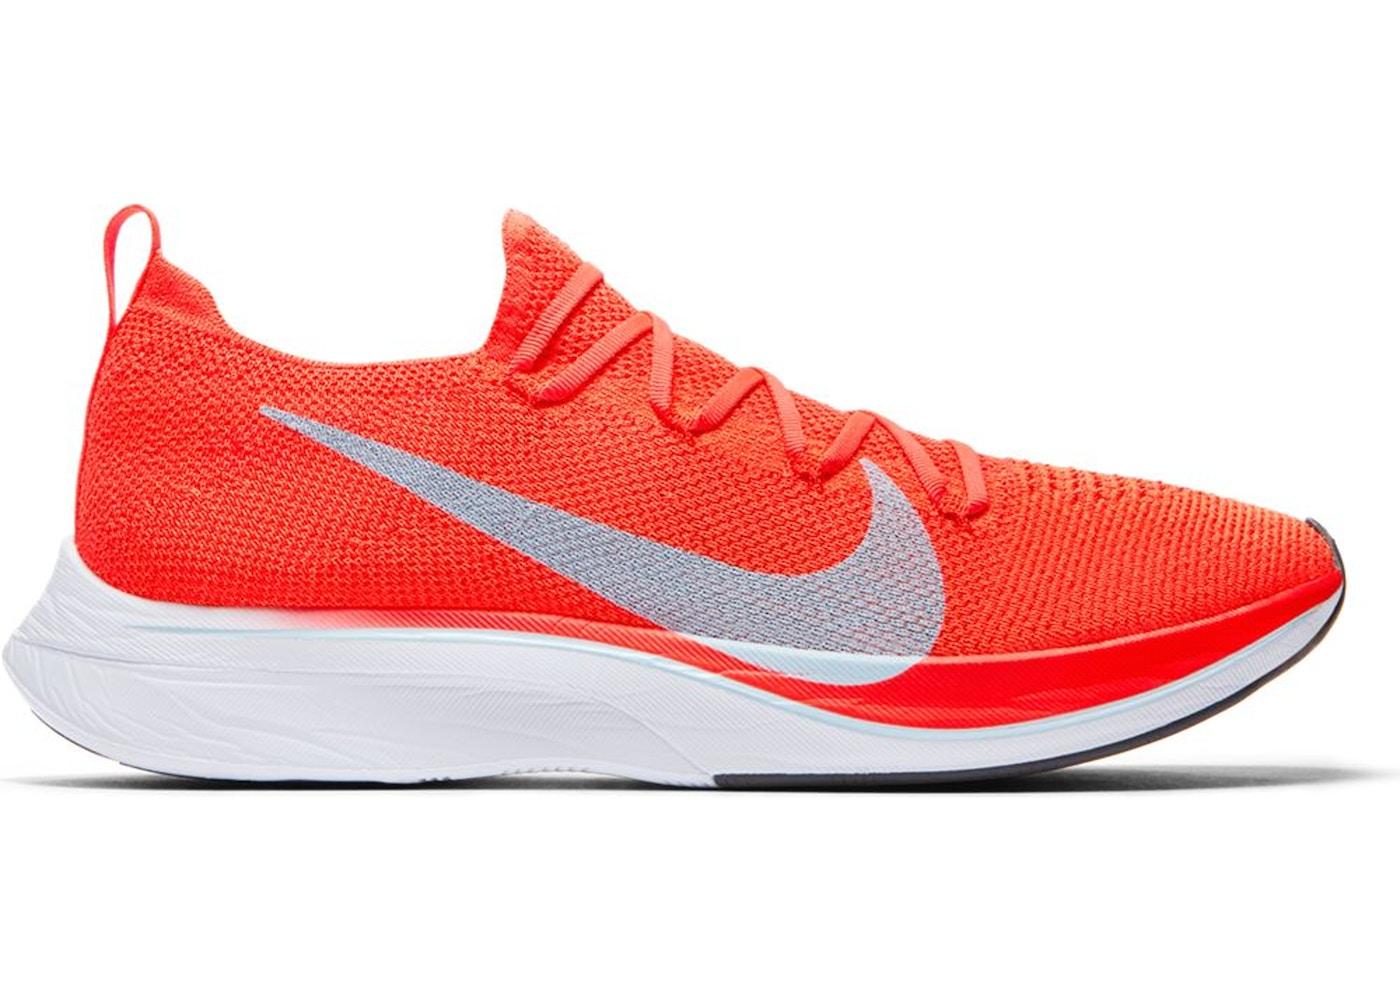 c5cfefba7f4b Nike Zoom VaporFly 4% Flyknit Bright Crimson - AJ3857-600